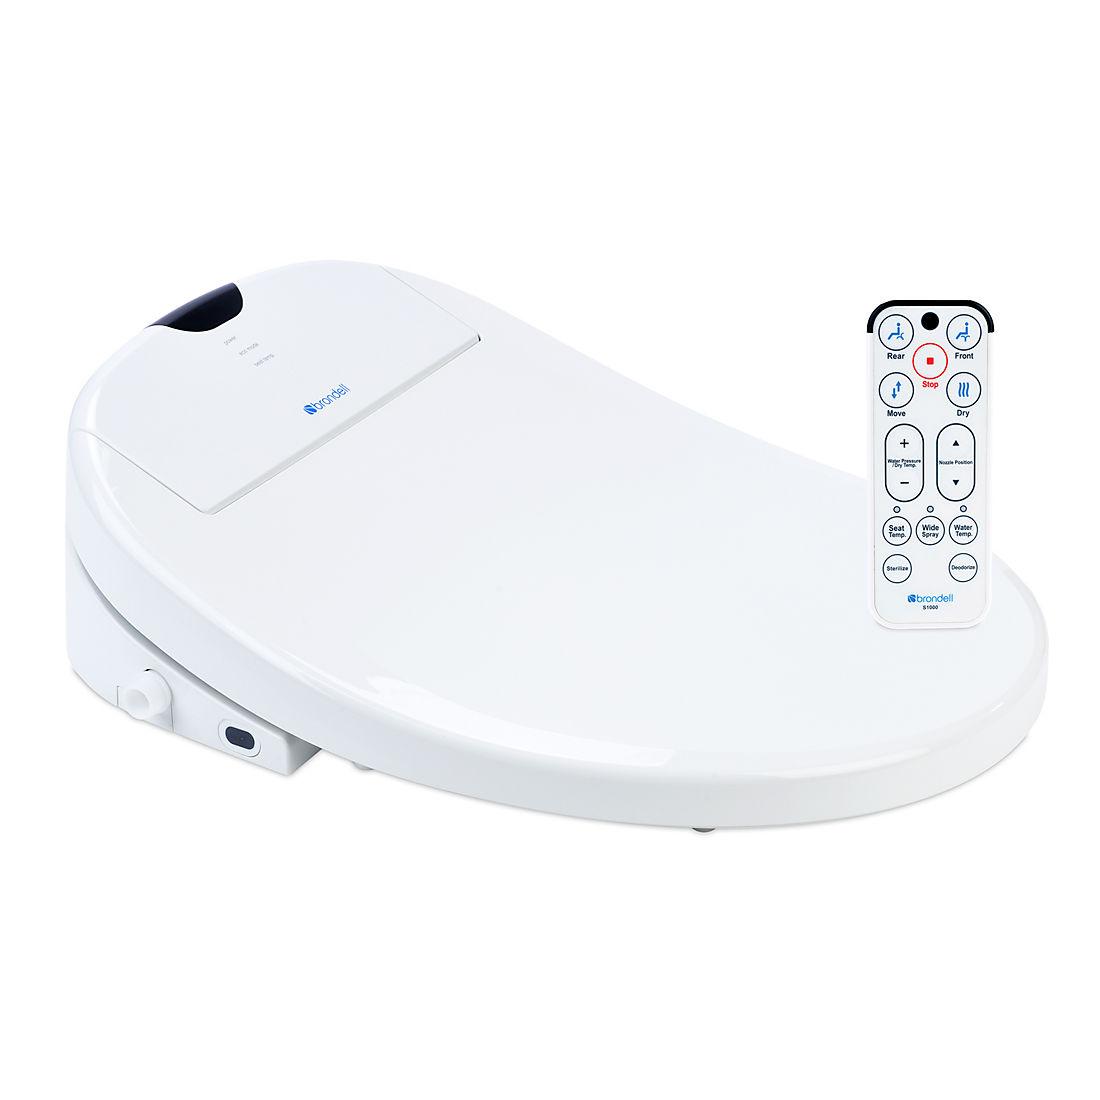 Sensational Brondell Swash 1000 Advanced Round Bidet Toilet Seat White Alphanode Cool Chair Designs And Ideas Alphanodeonline